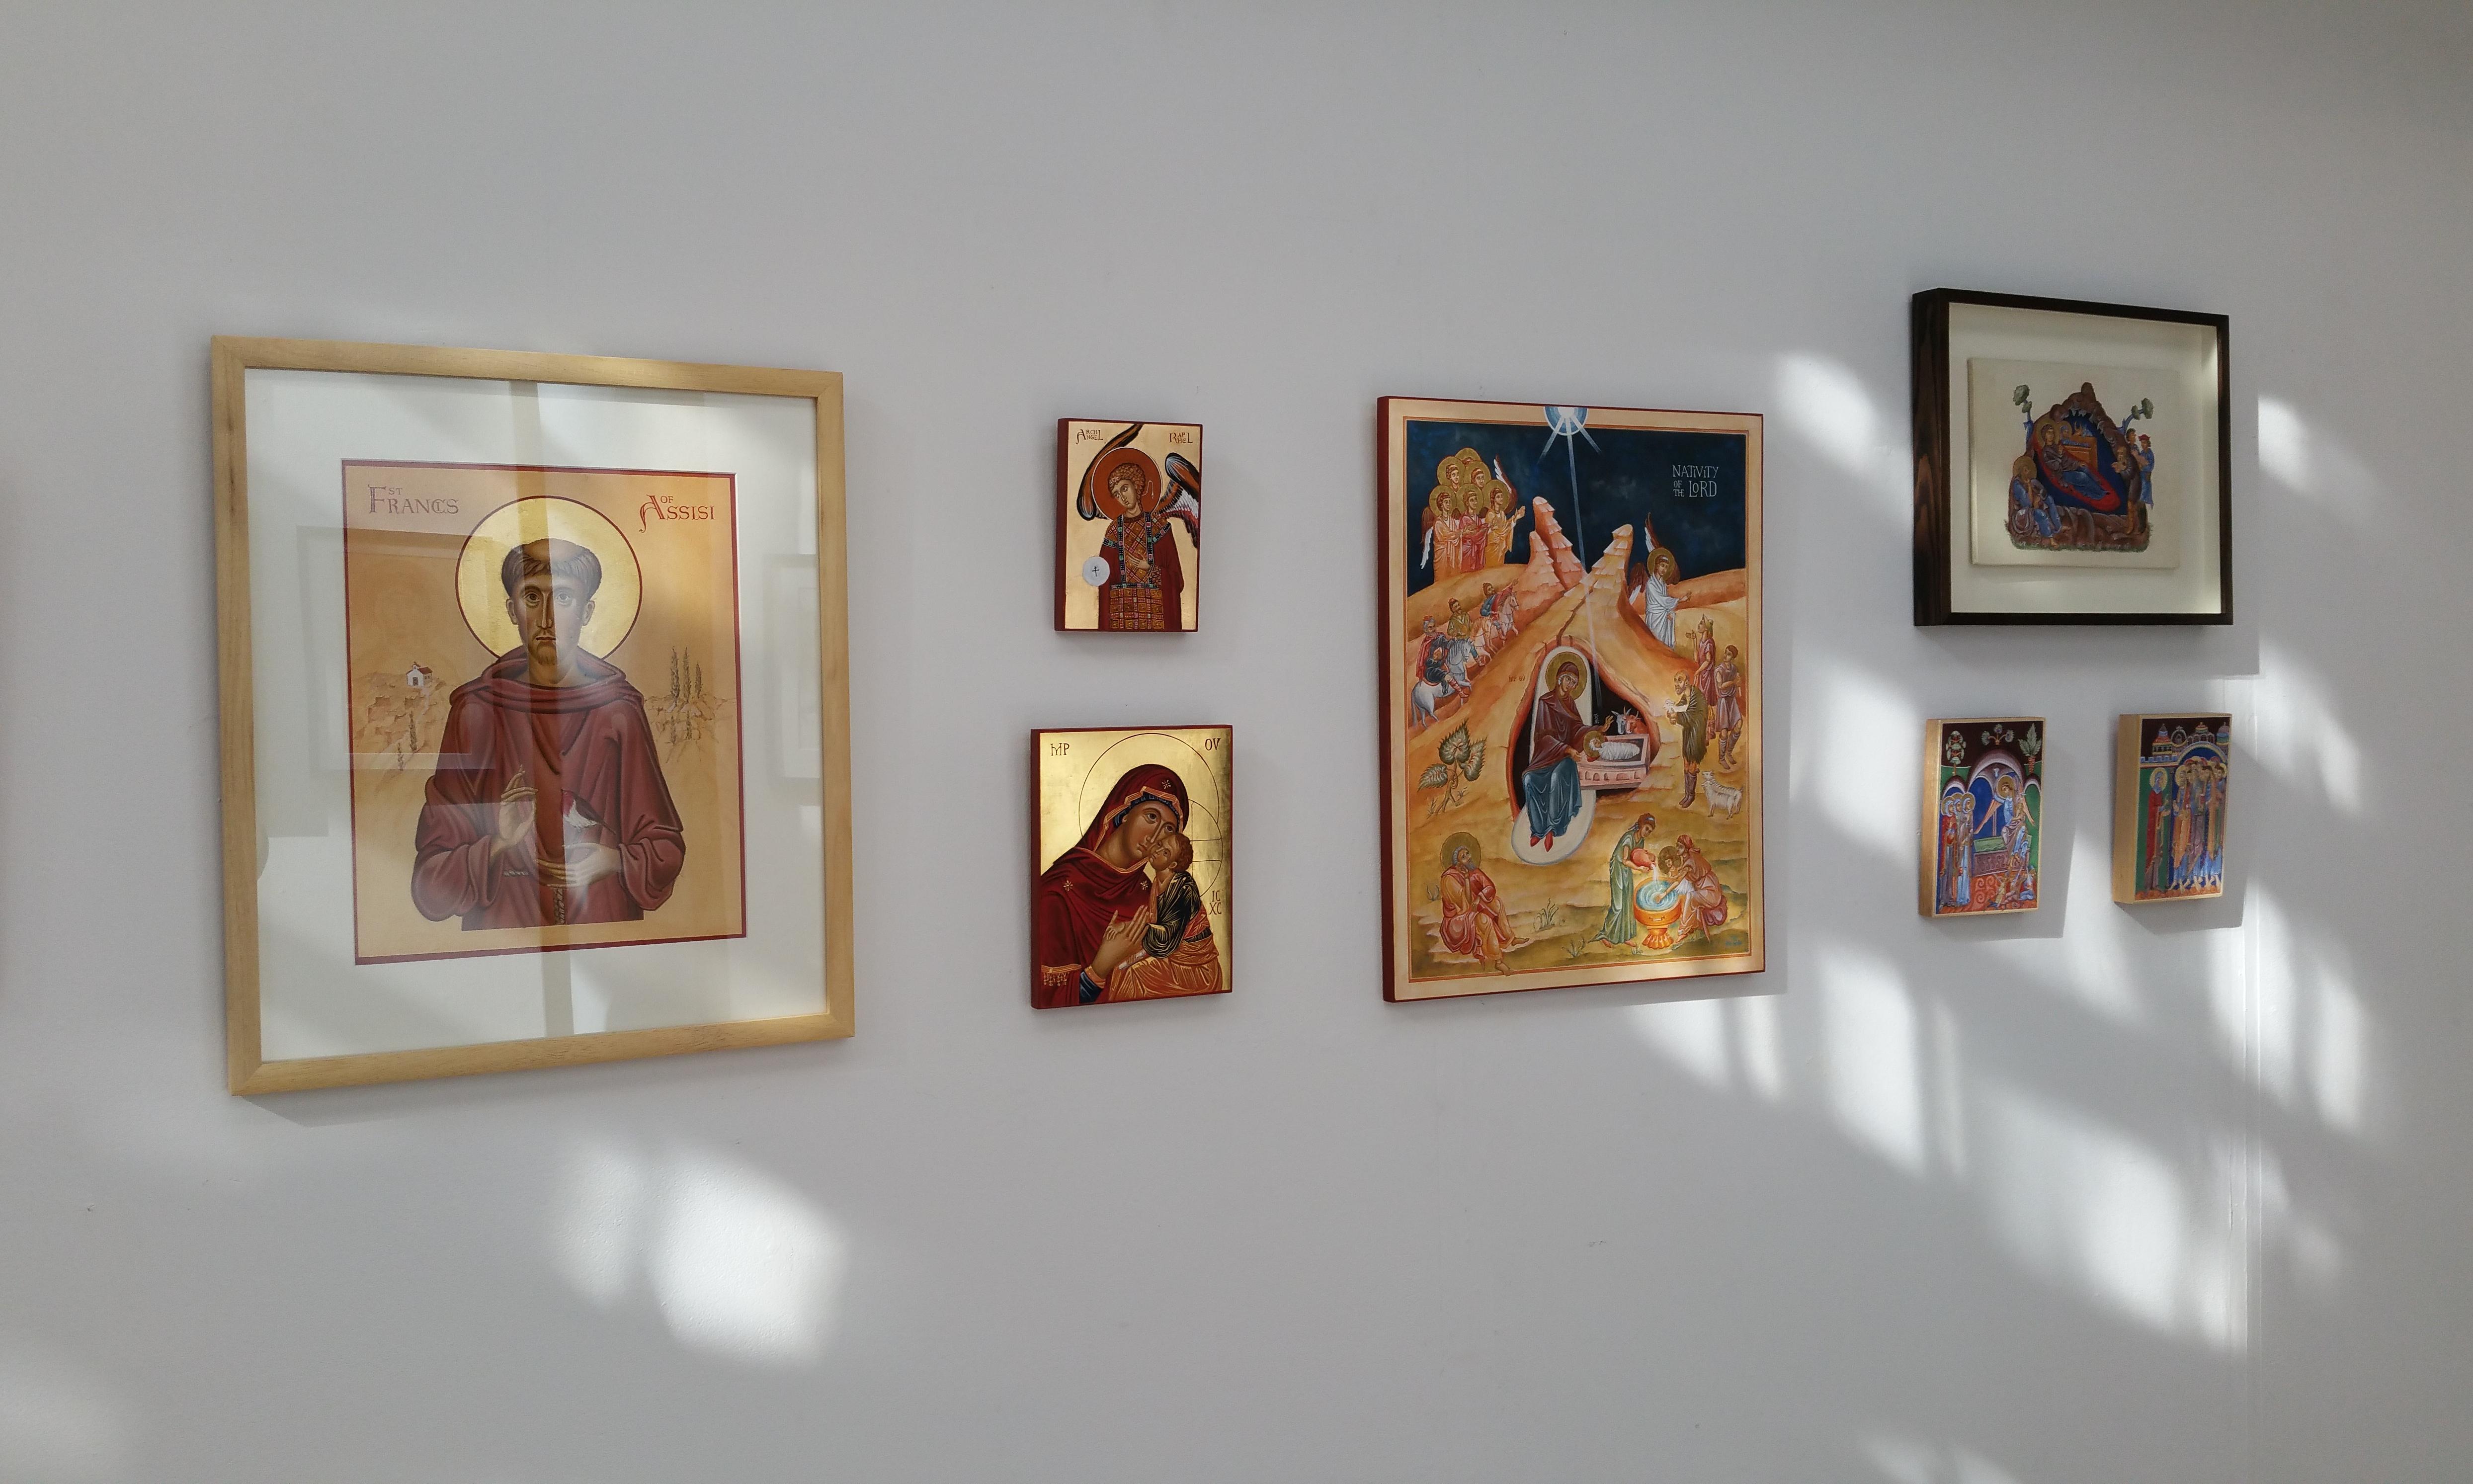 icons by Ronnie Cruwys